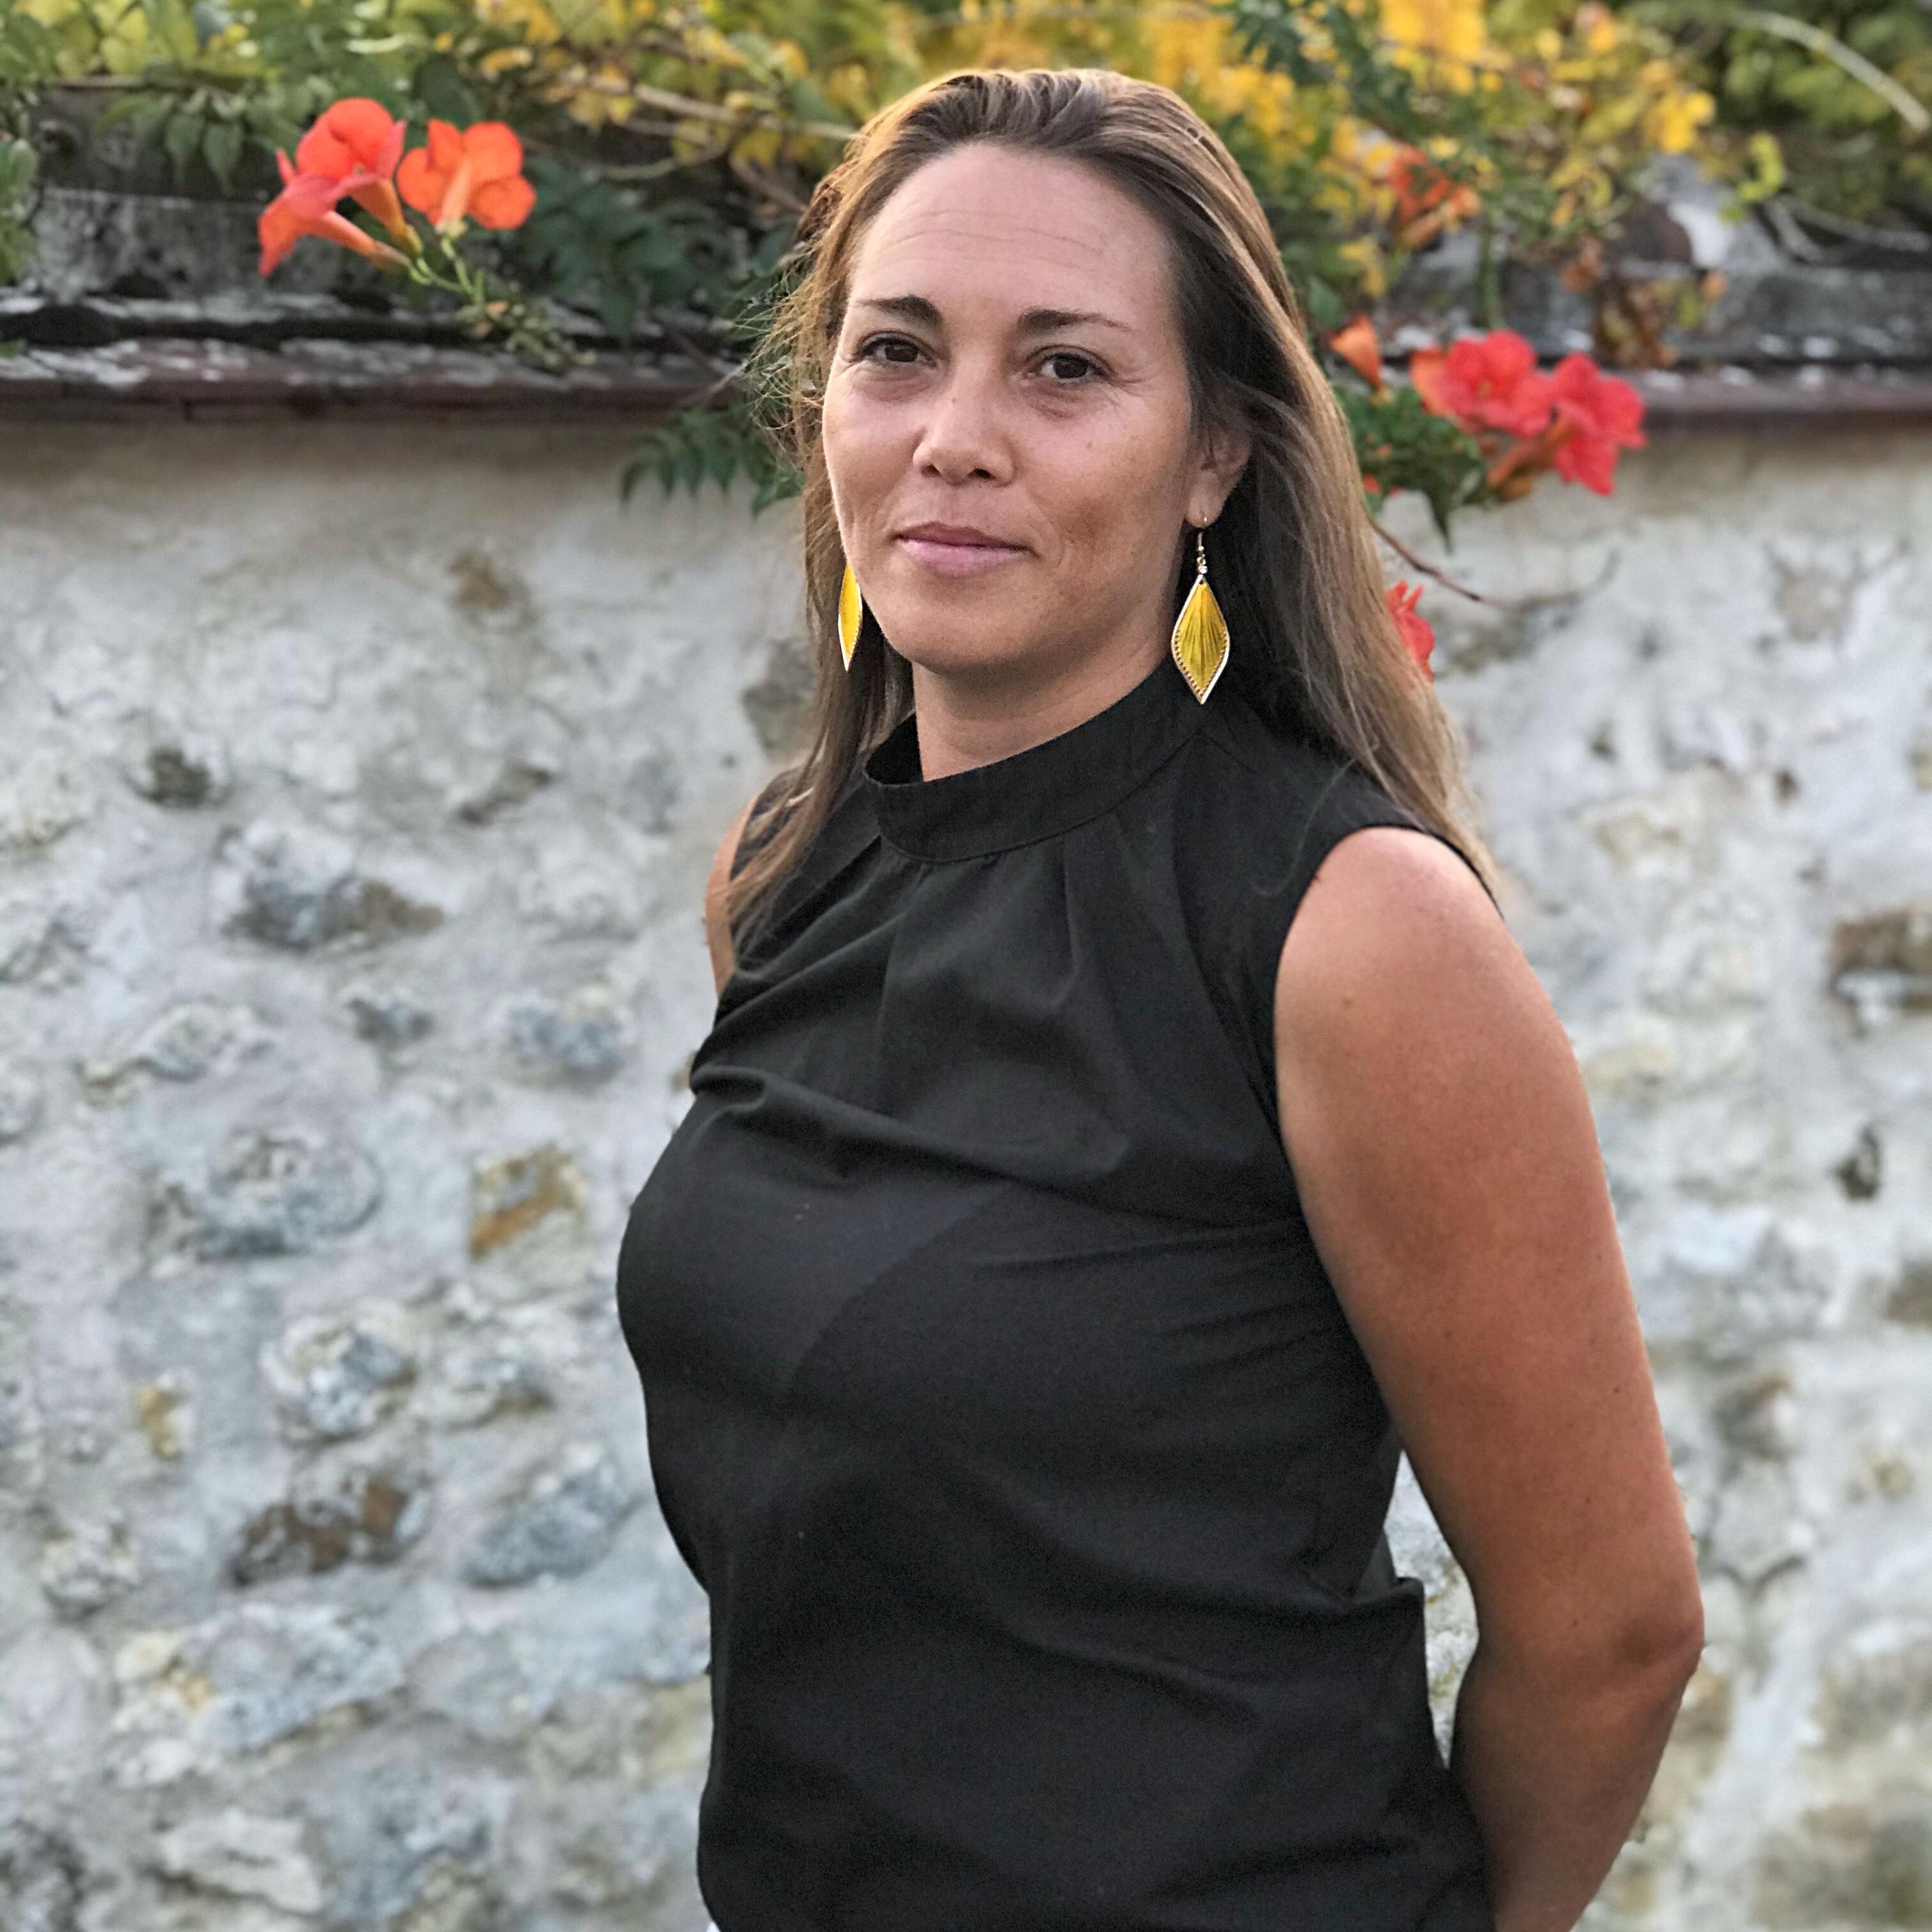 SABRINA BUCHER